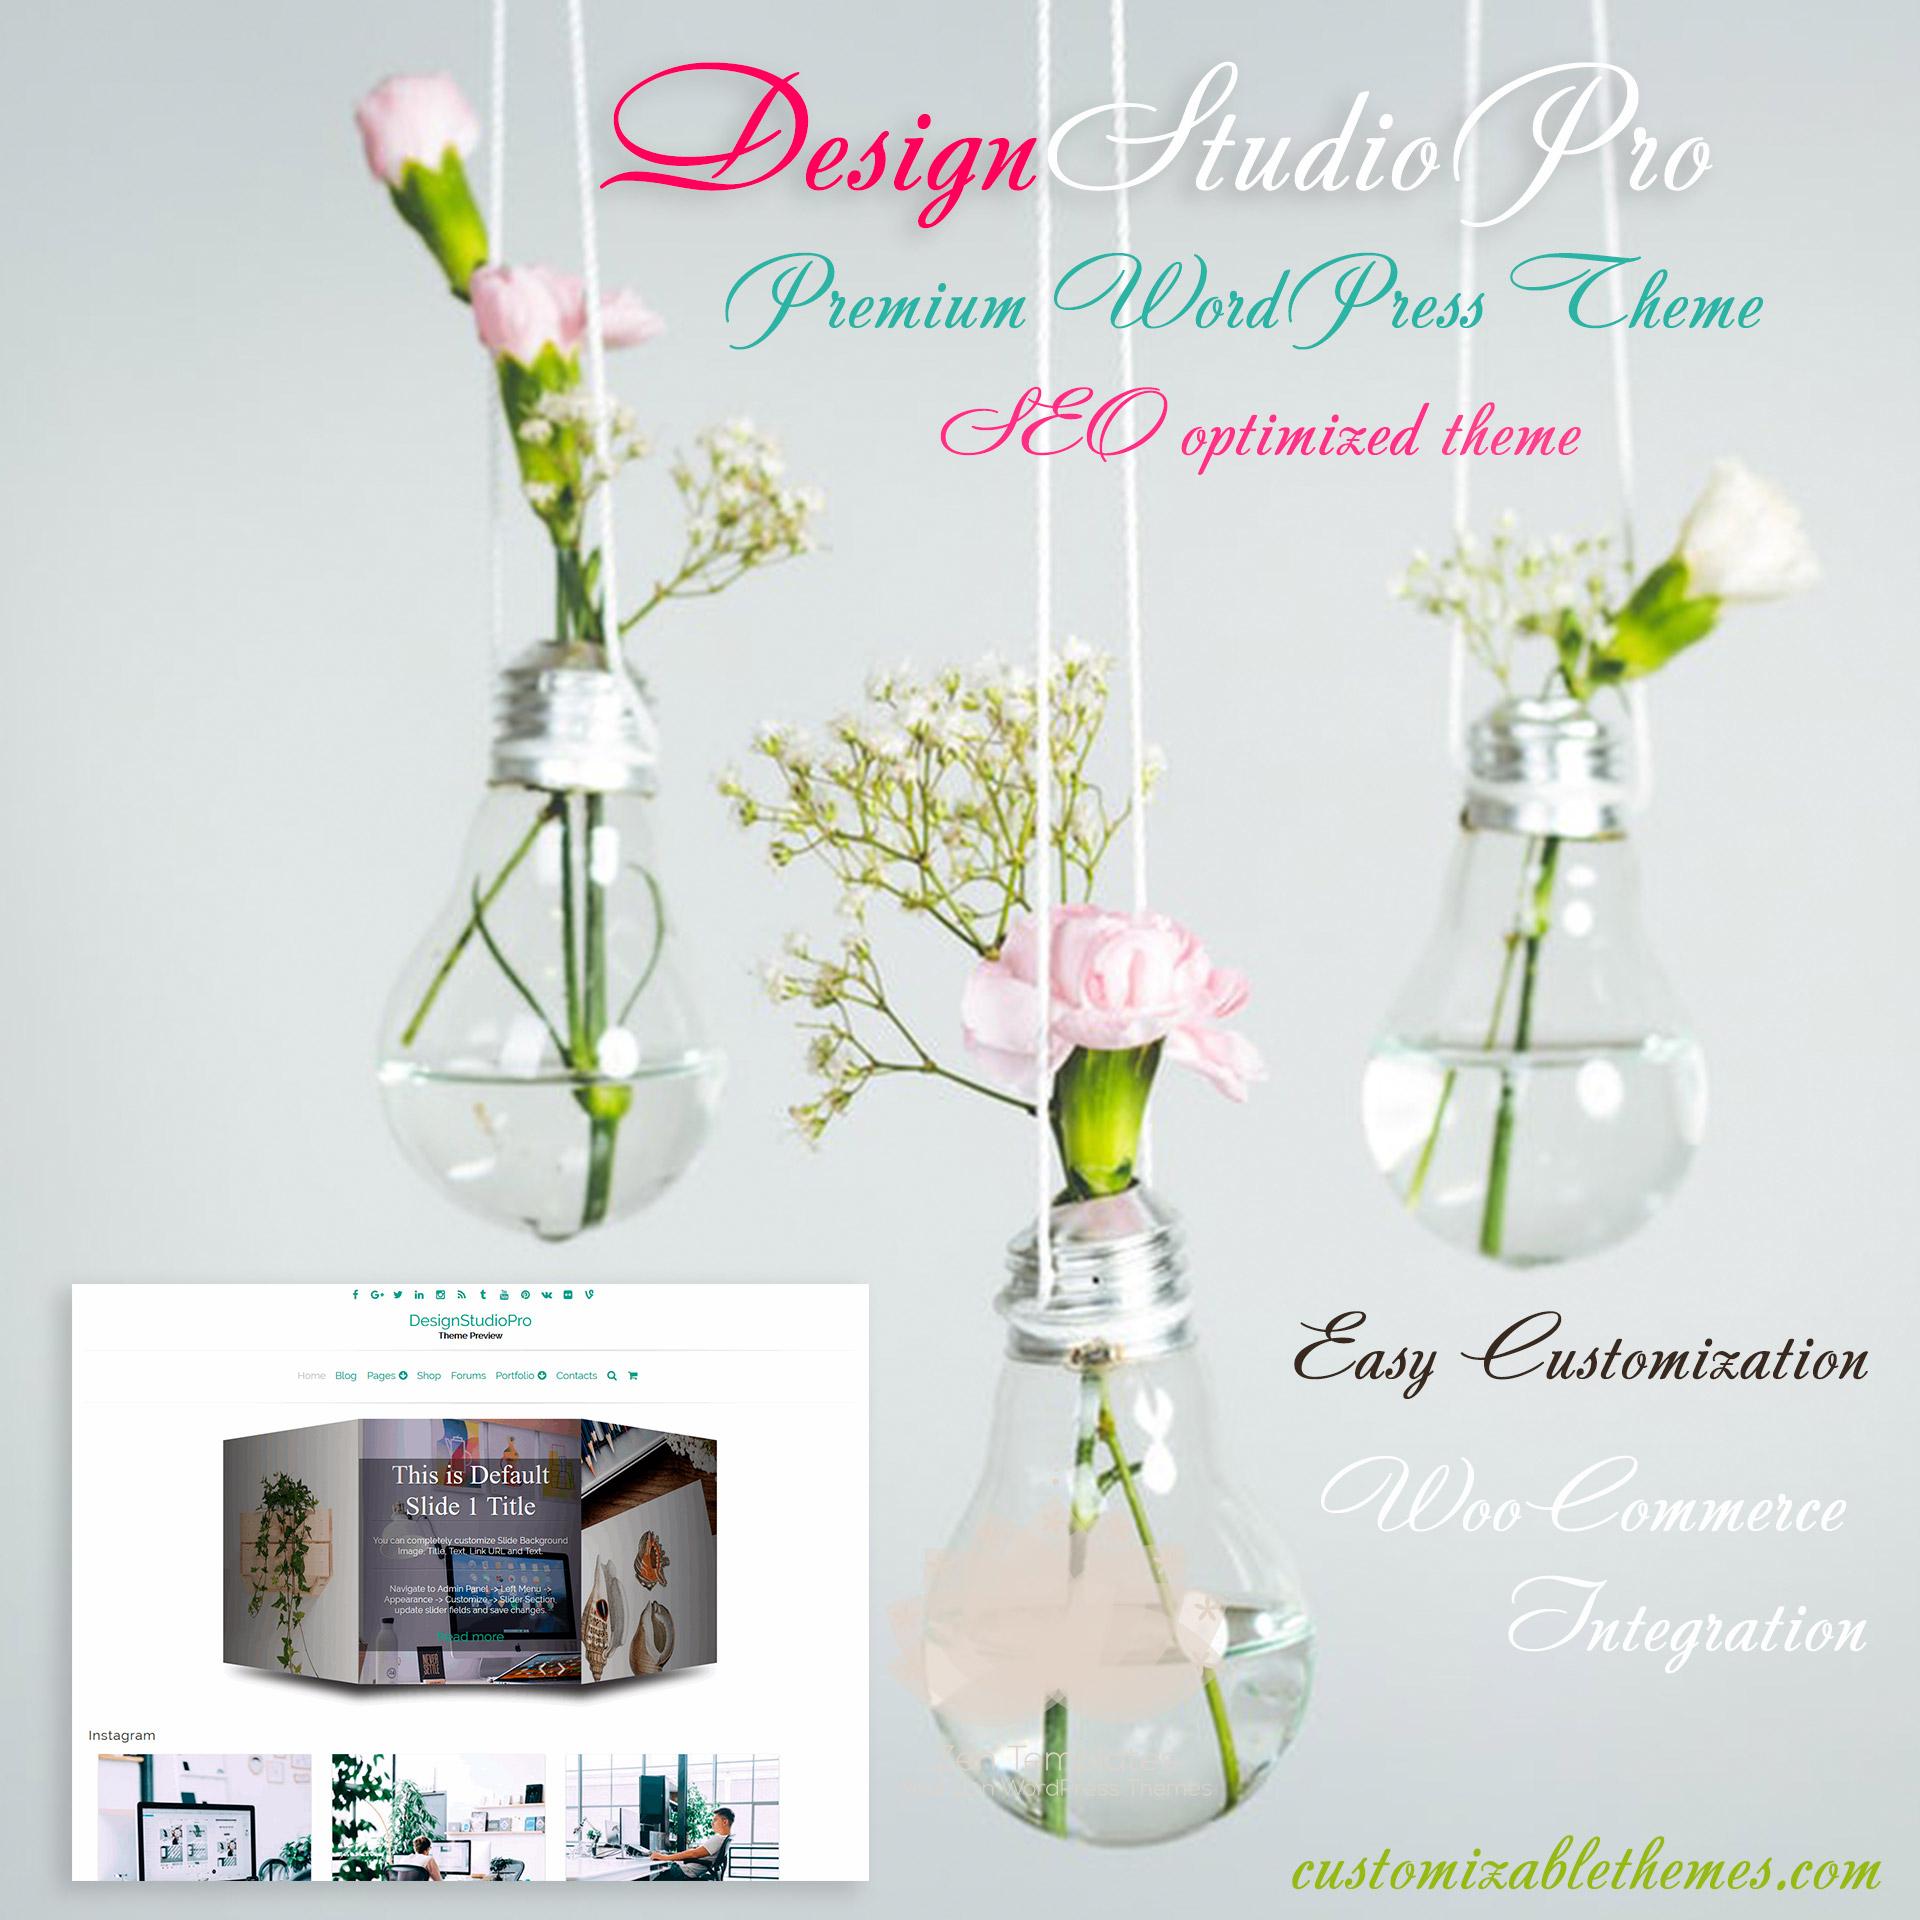 designstudiopro-premium-wordpress-theme-mockup-customizablethemes-com